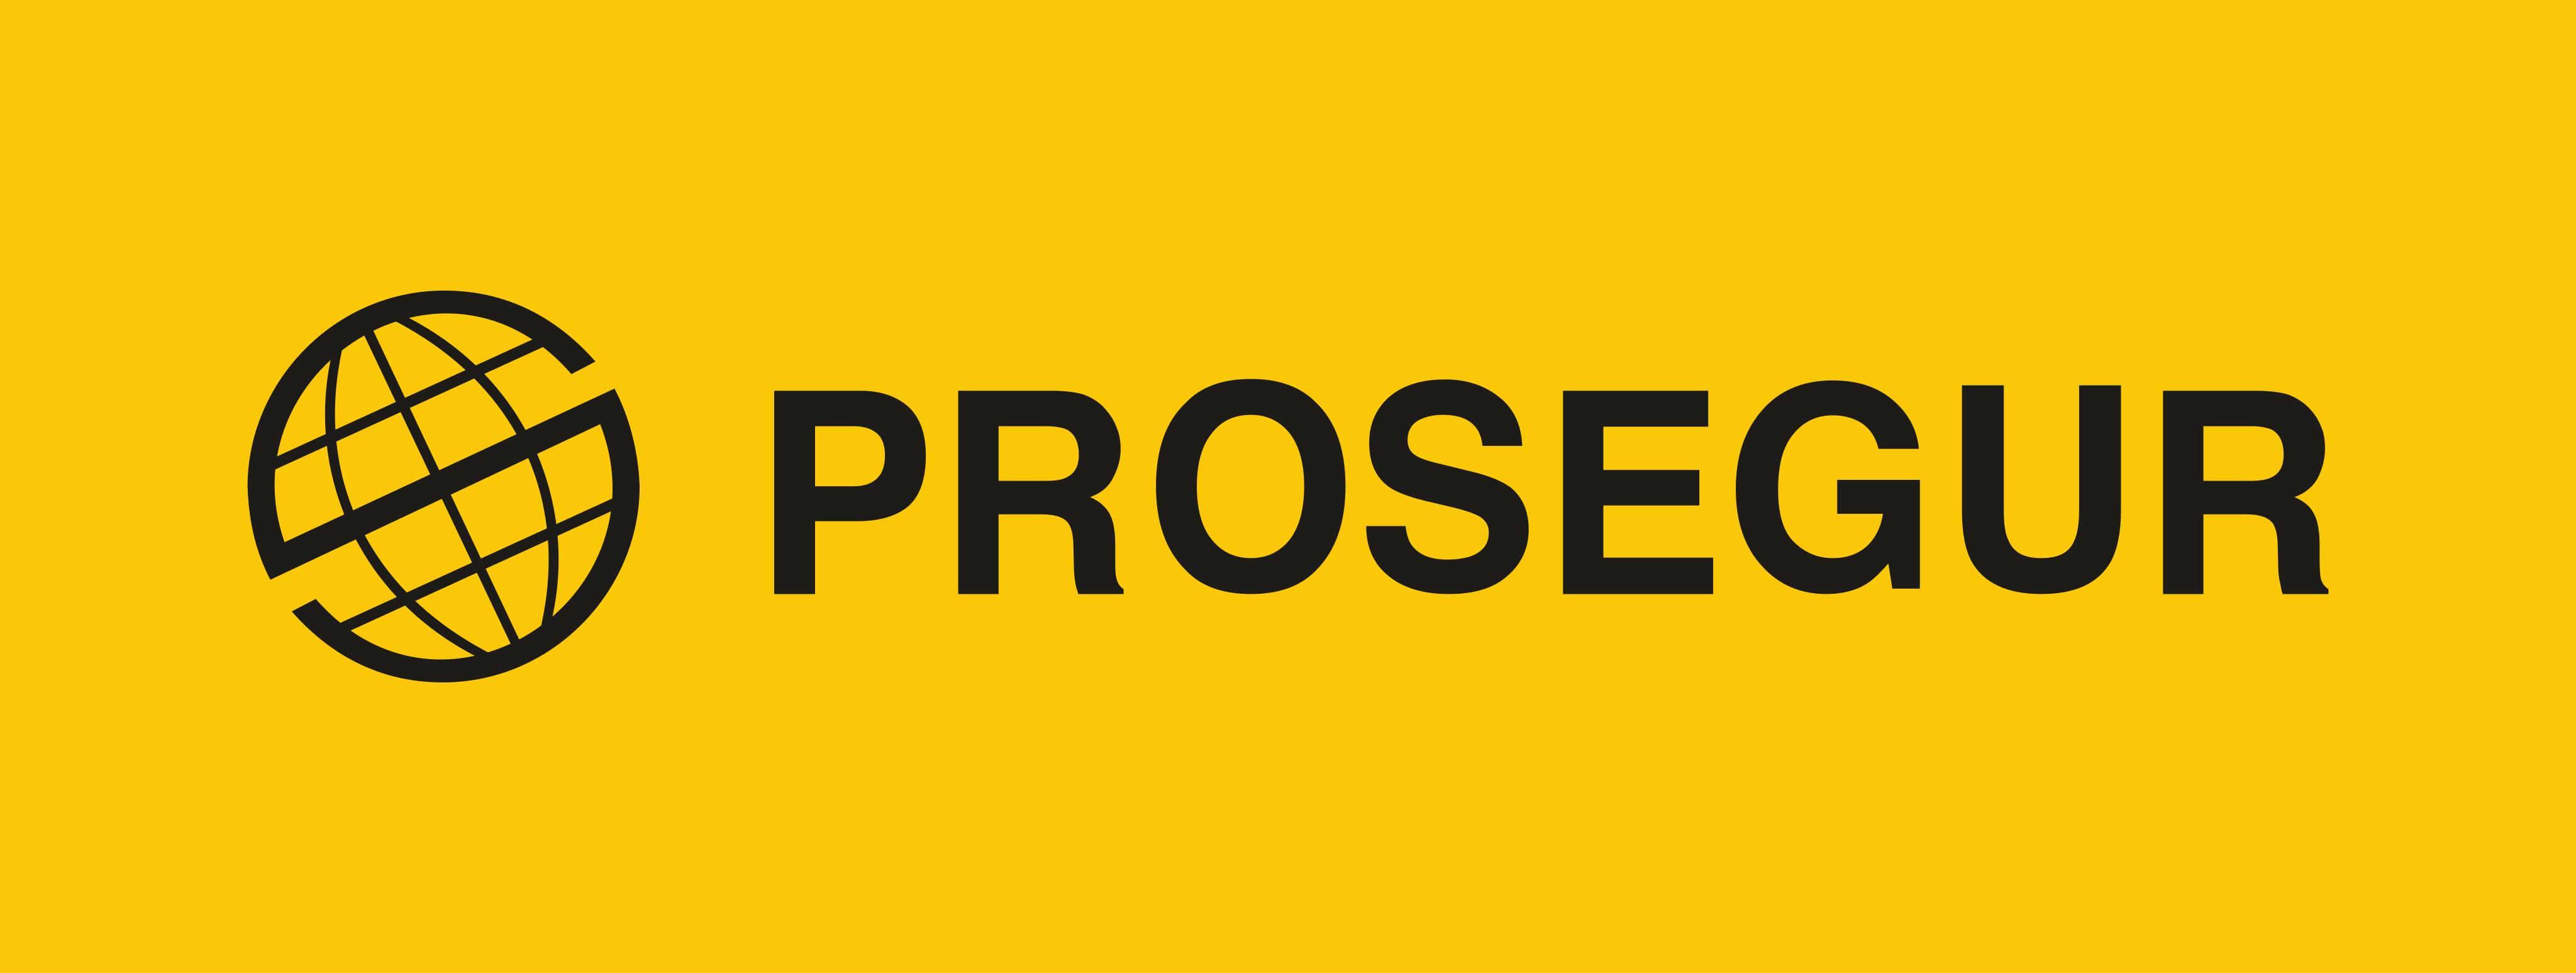 prosegur logo - Prosegur Logo